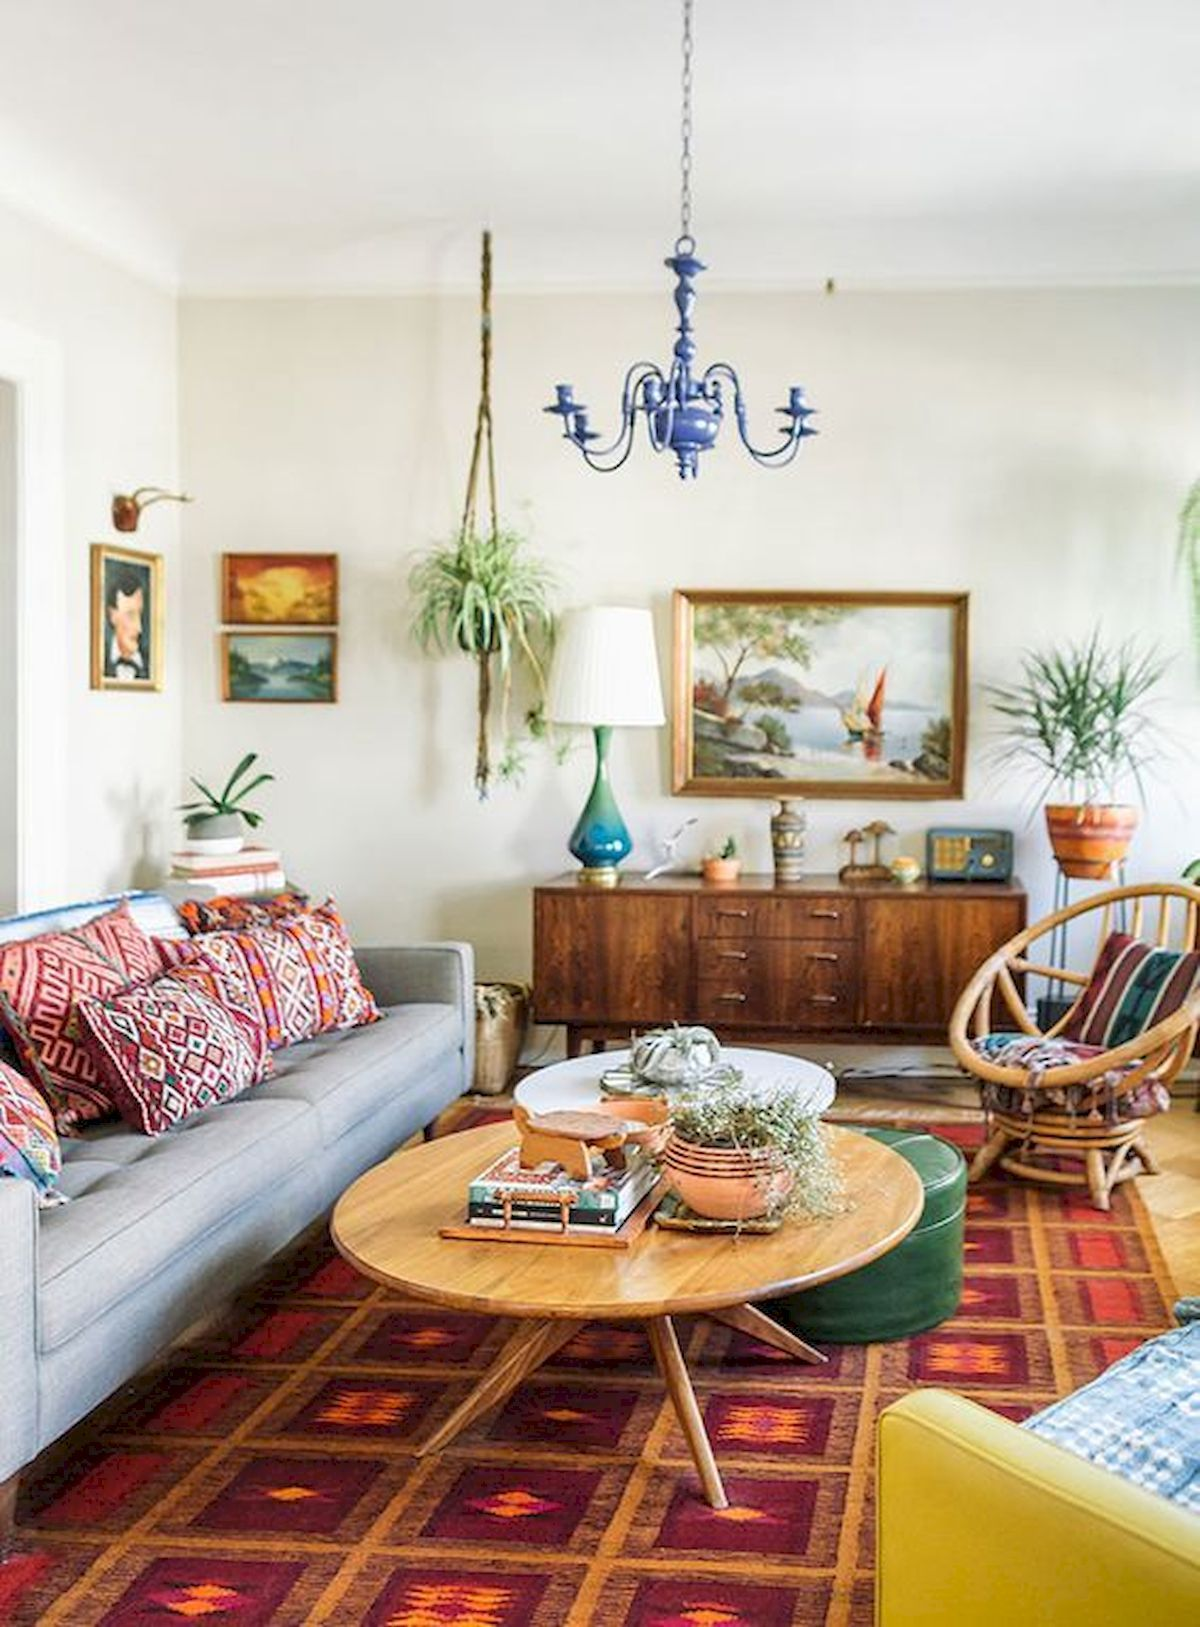 Modern bohemian home decor   Modern Bohemian And Mid Century Living Room Design Ideas And